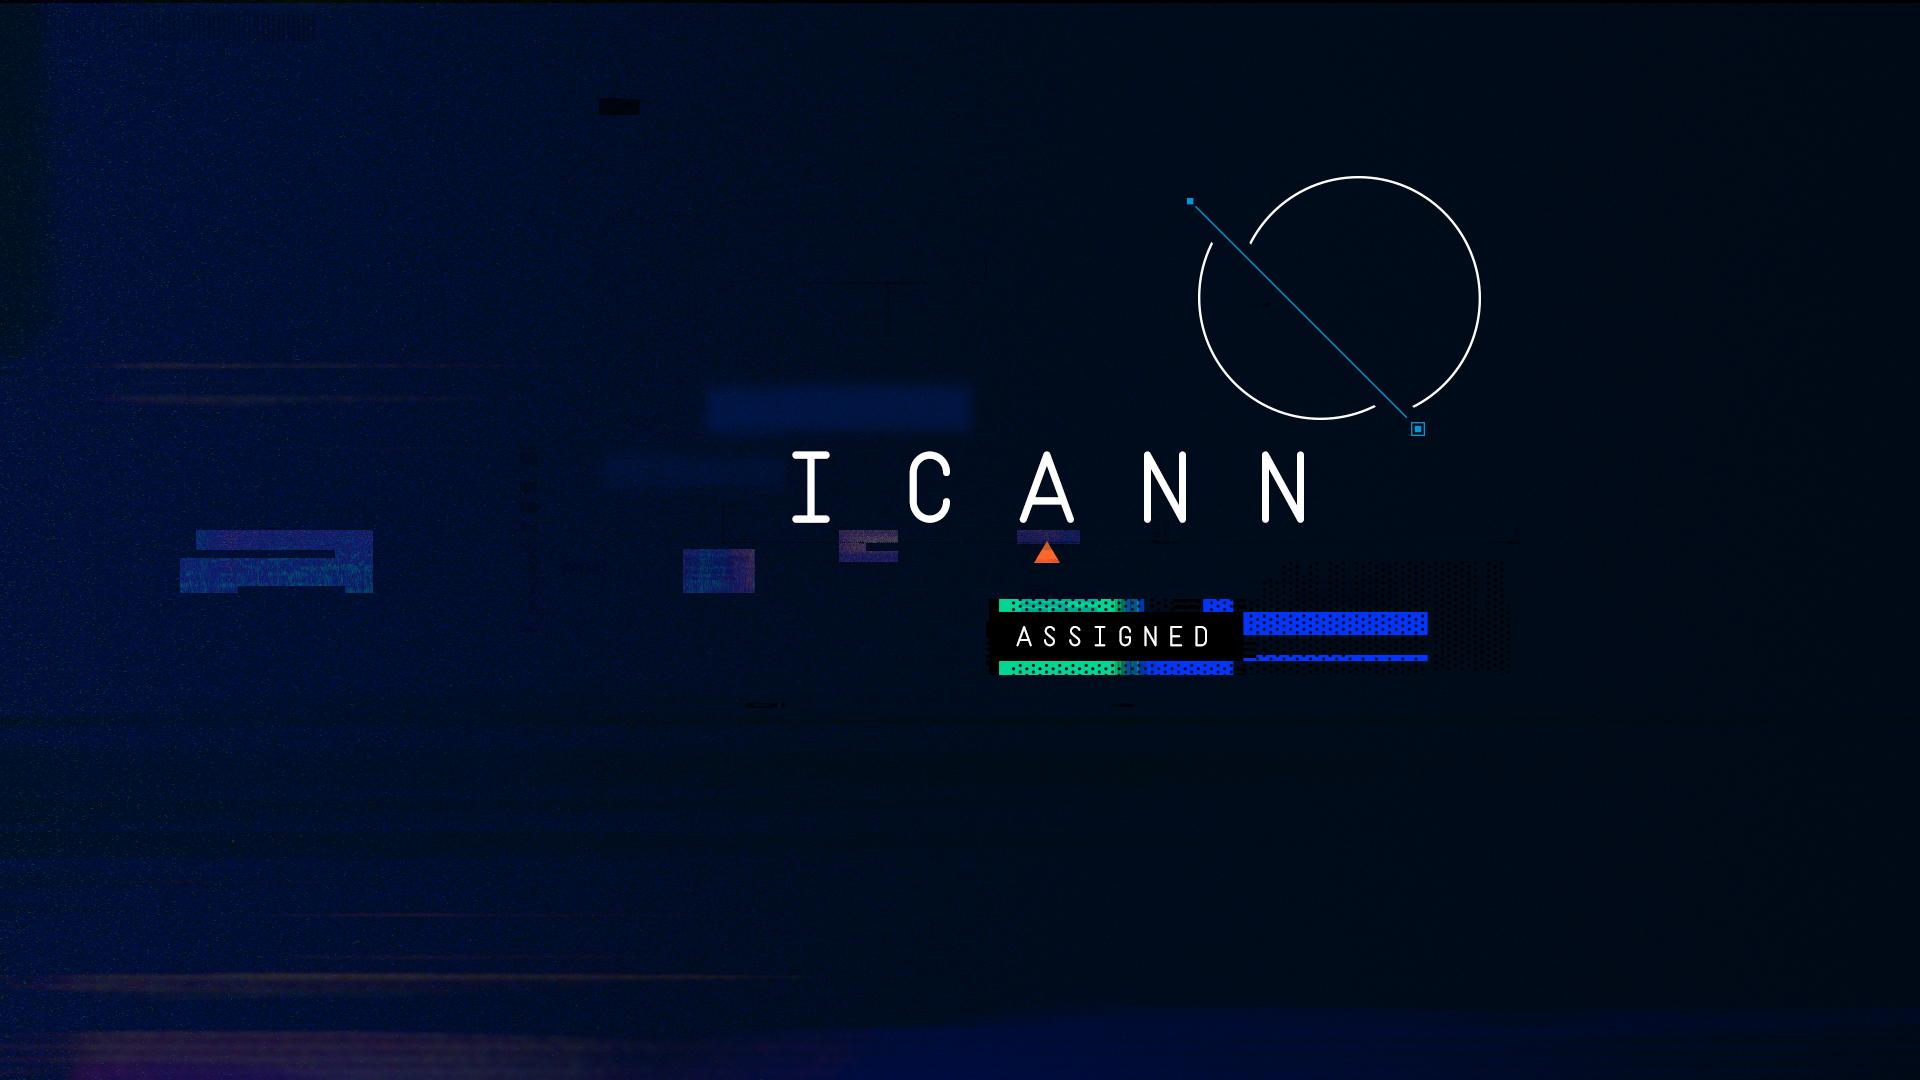 ICANN-Styleframe04.jpg